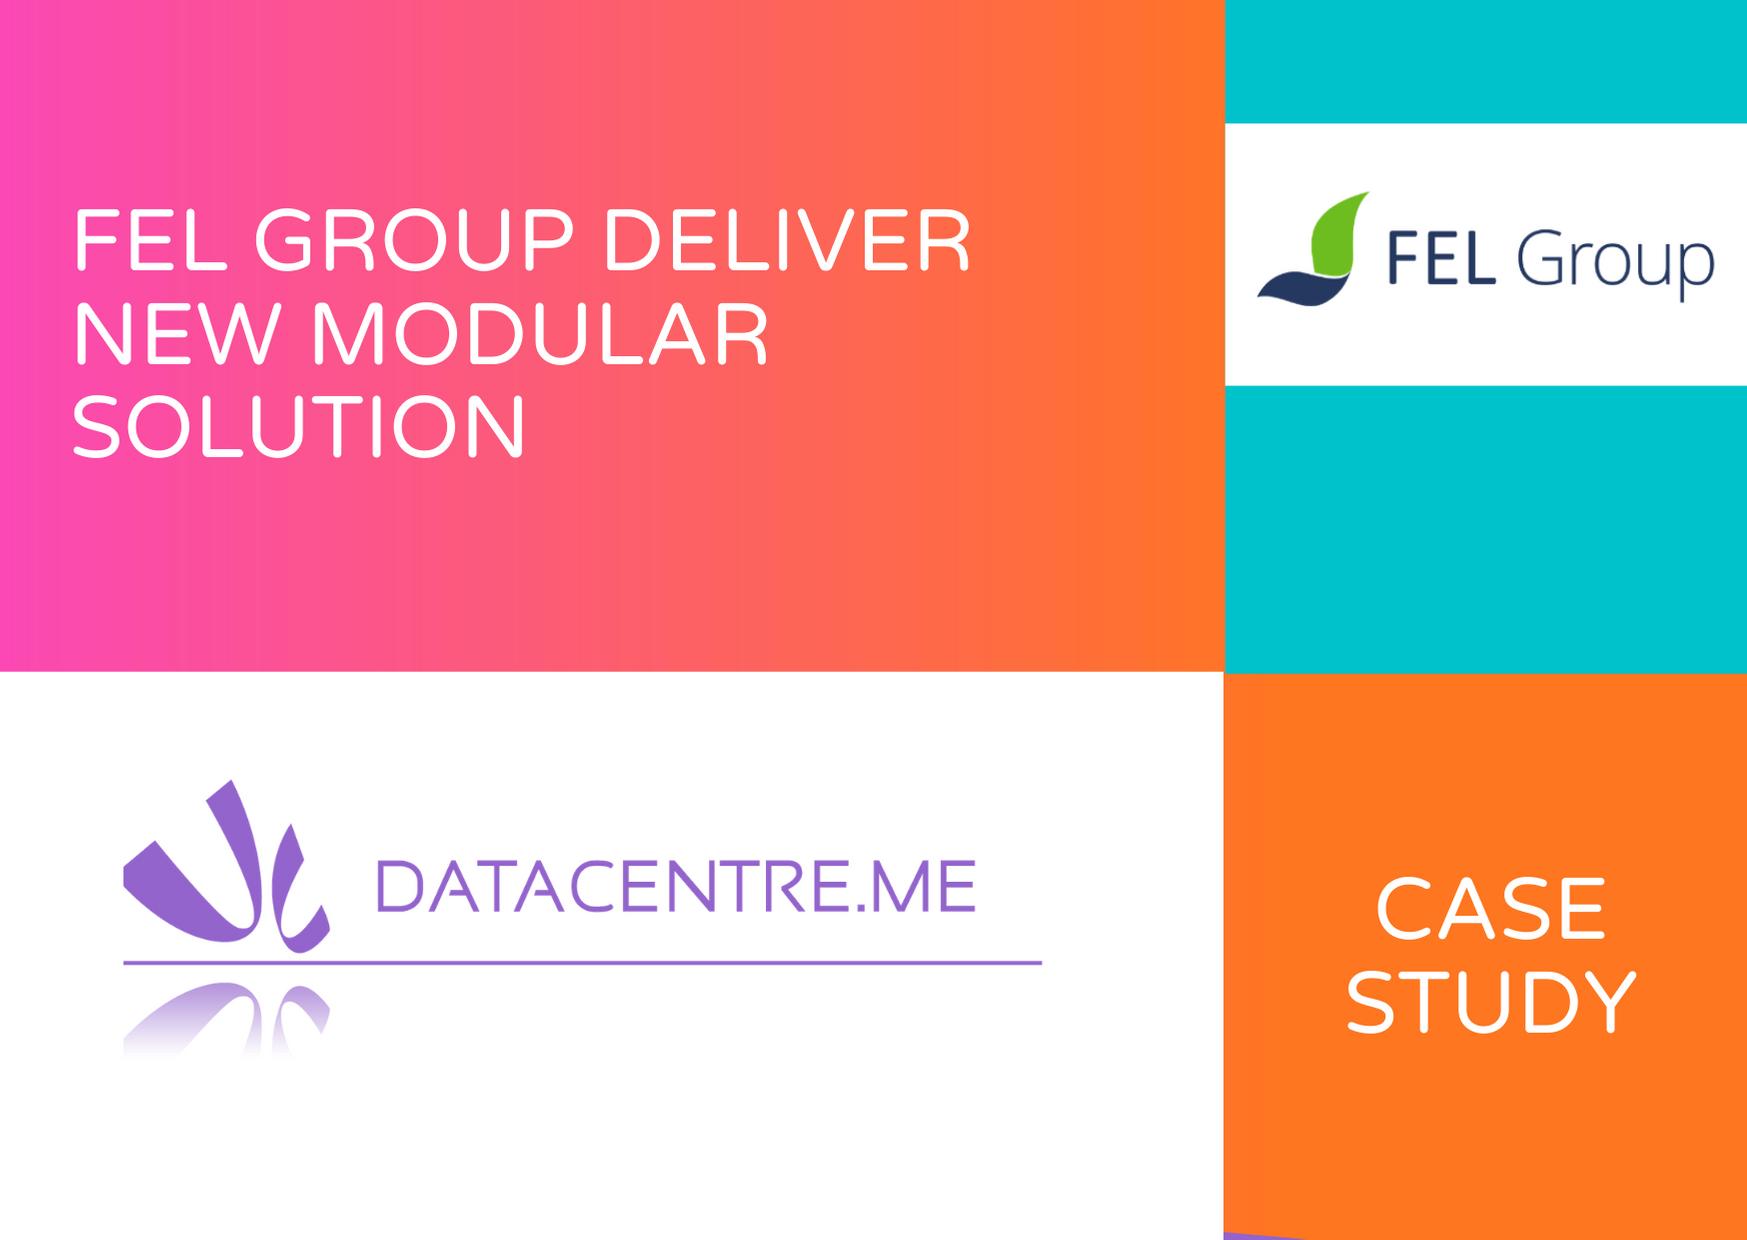 FEL Group deliver new modular solution case study